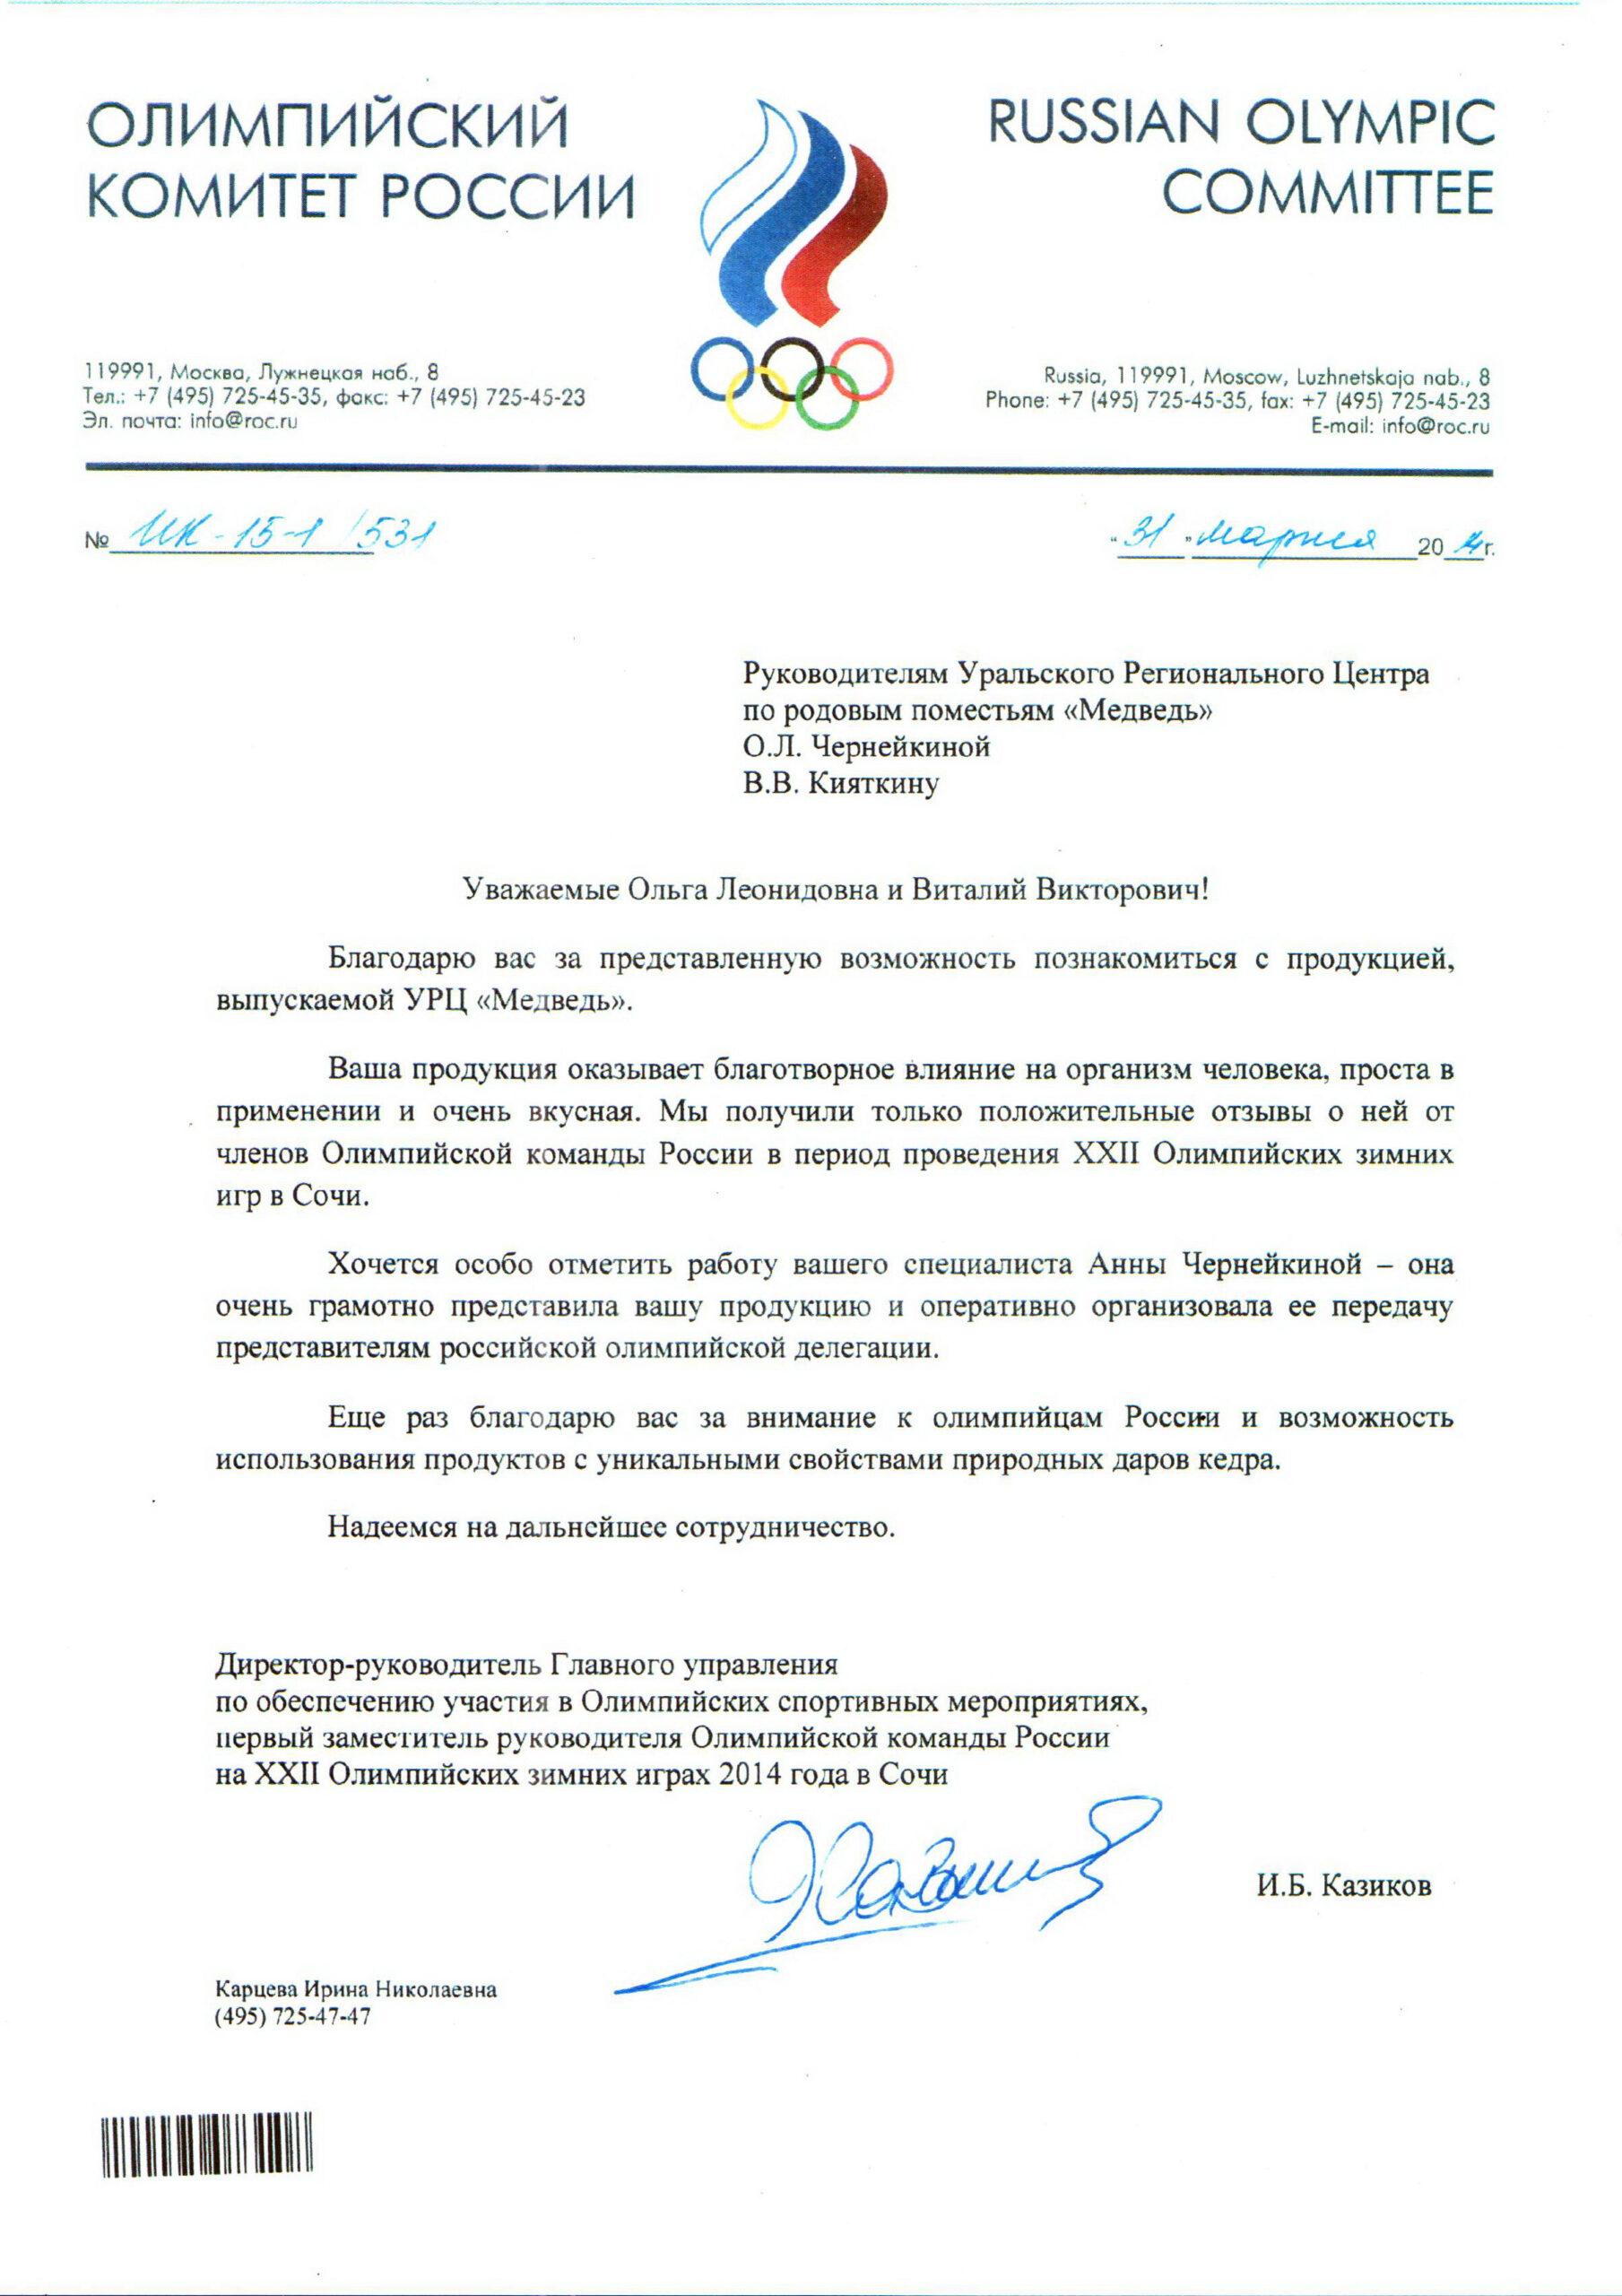 Награда от Олимпийского комитета России